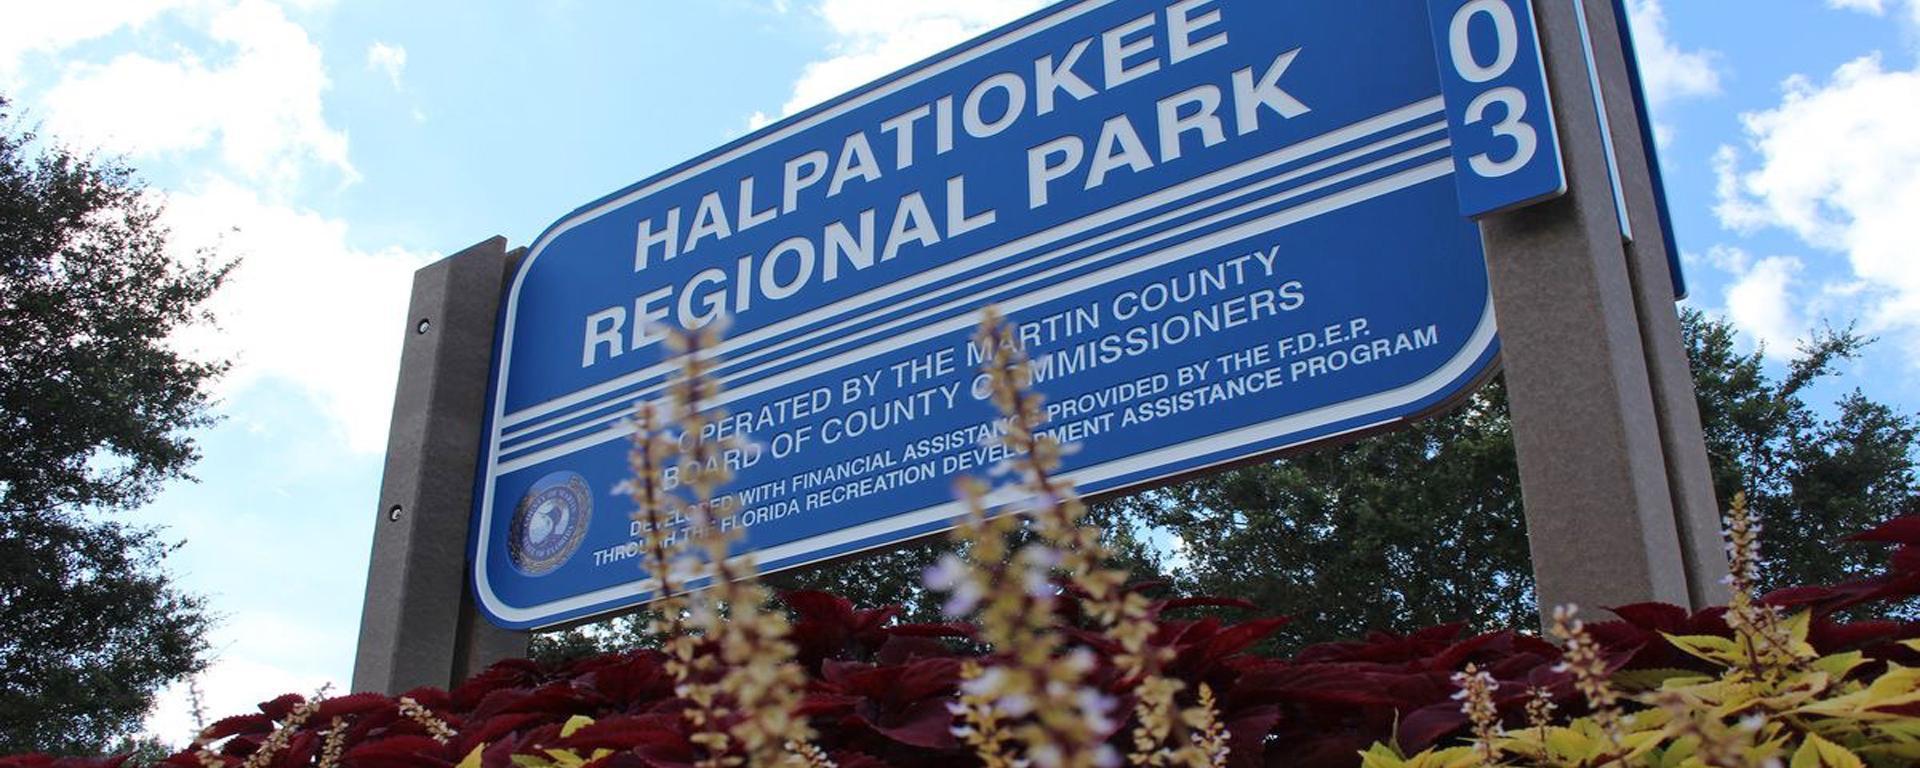 An image of Halpatiokee Park